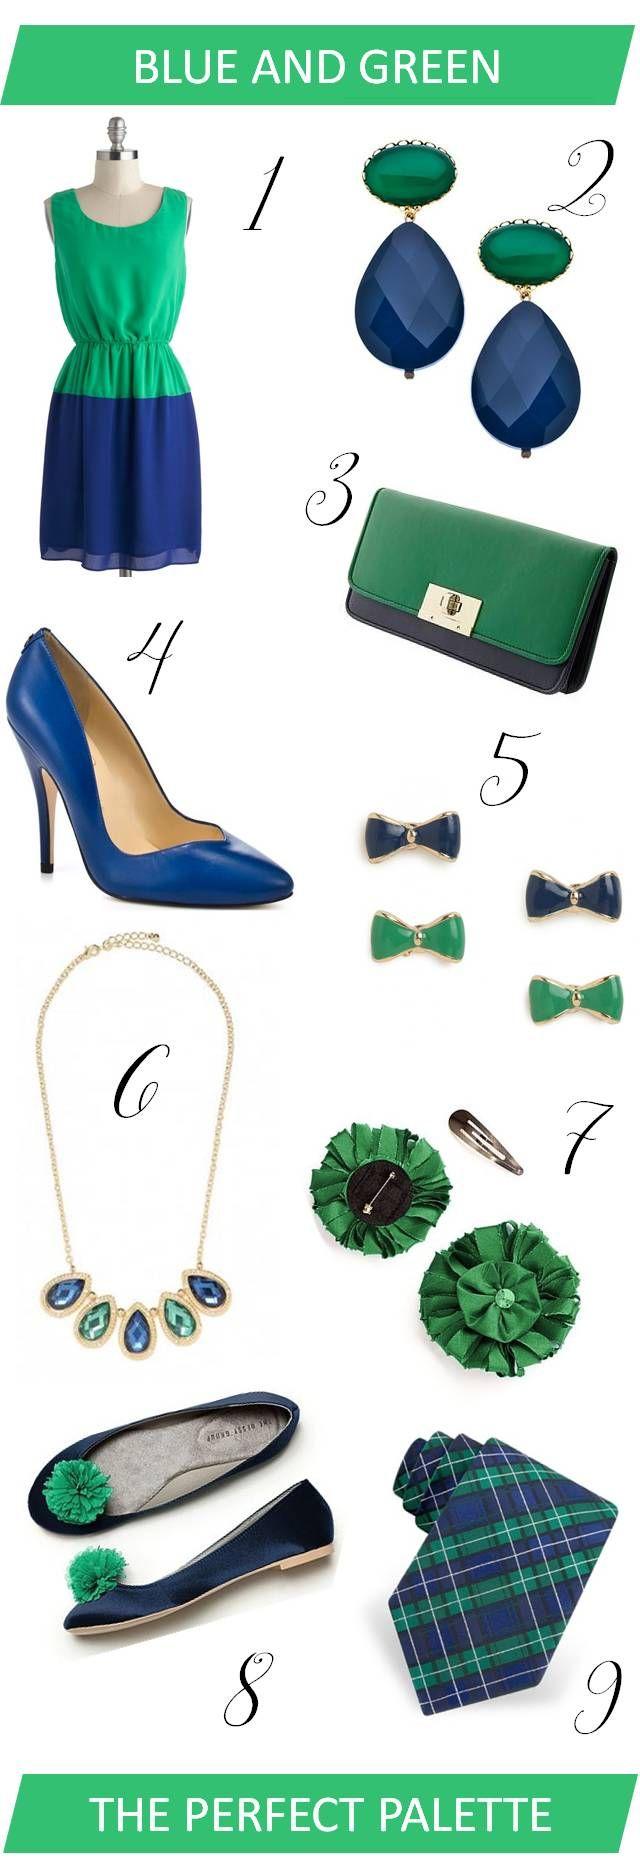 {Wedding Wardrobe}: Navy Blue + Kelly Green! http://www.theperfectpalette.com/2013/03/wedding-wardrobe-navy-blue-kelly-green.html